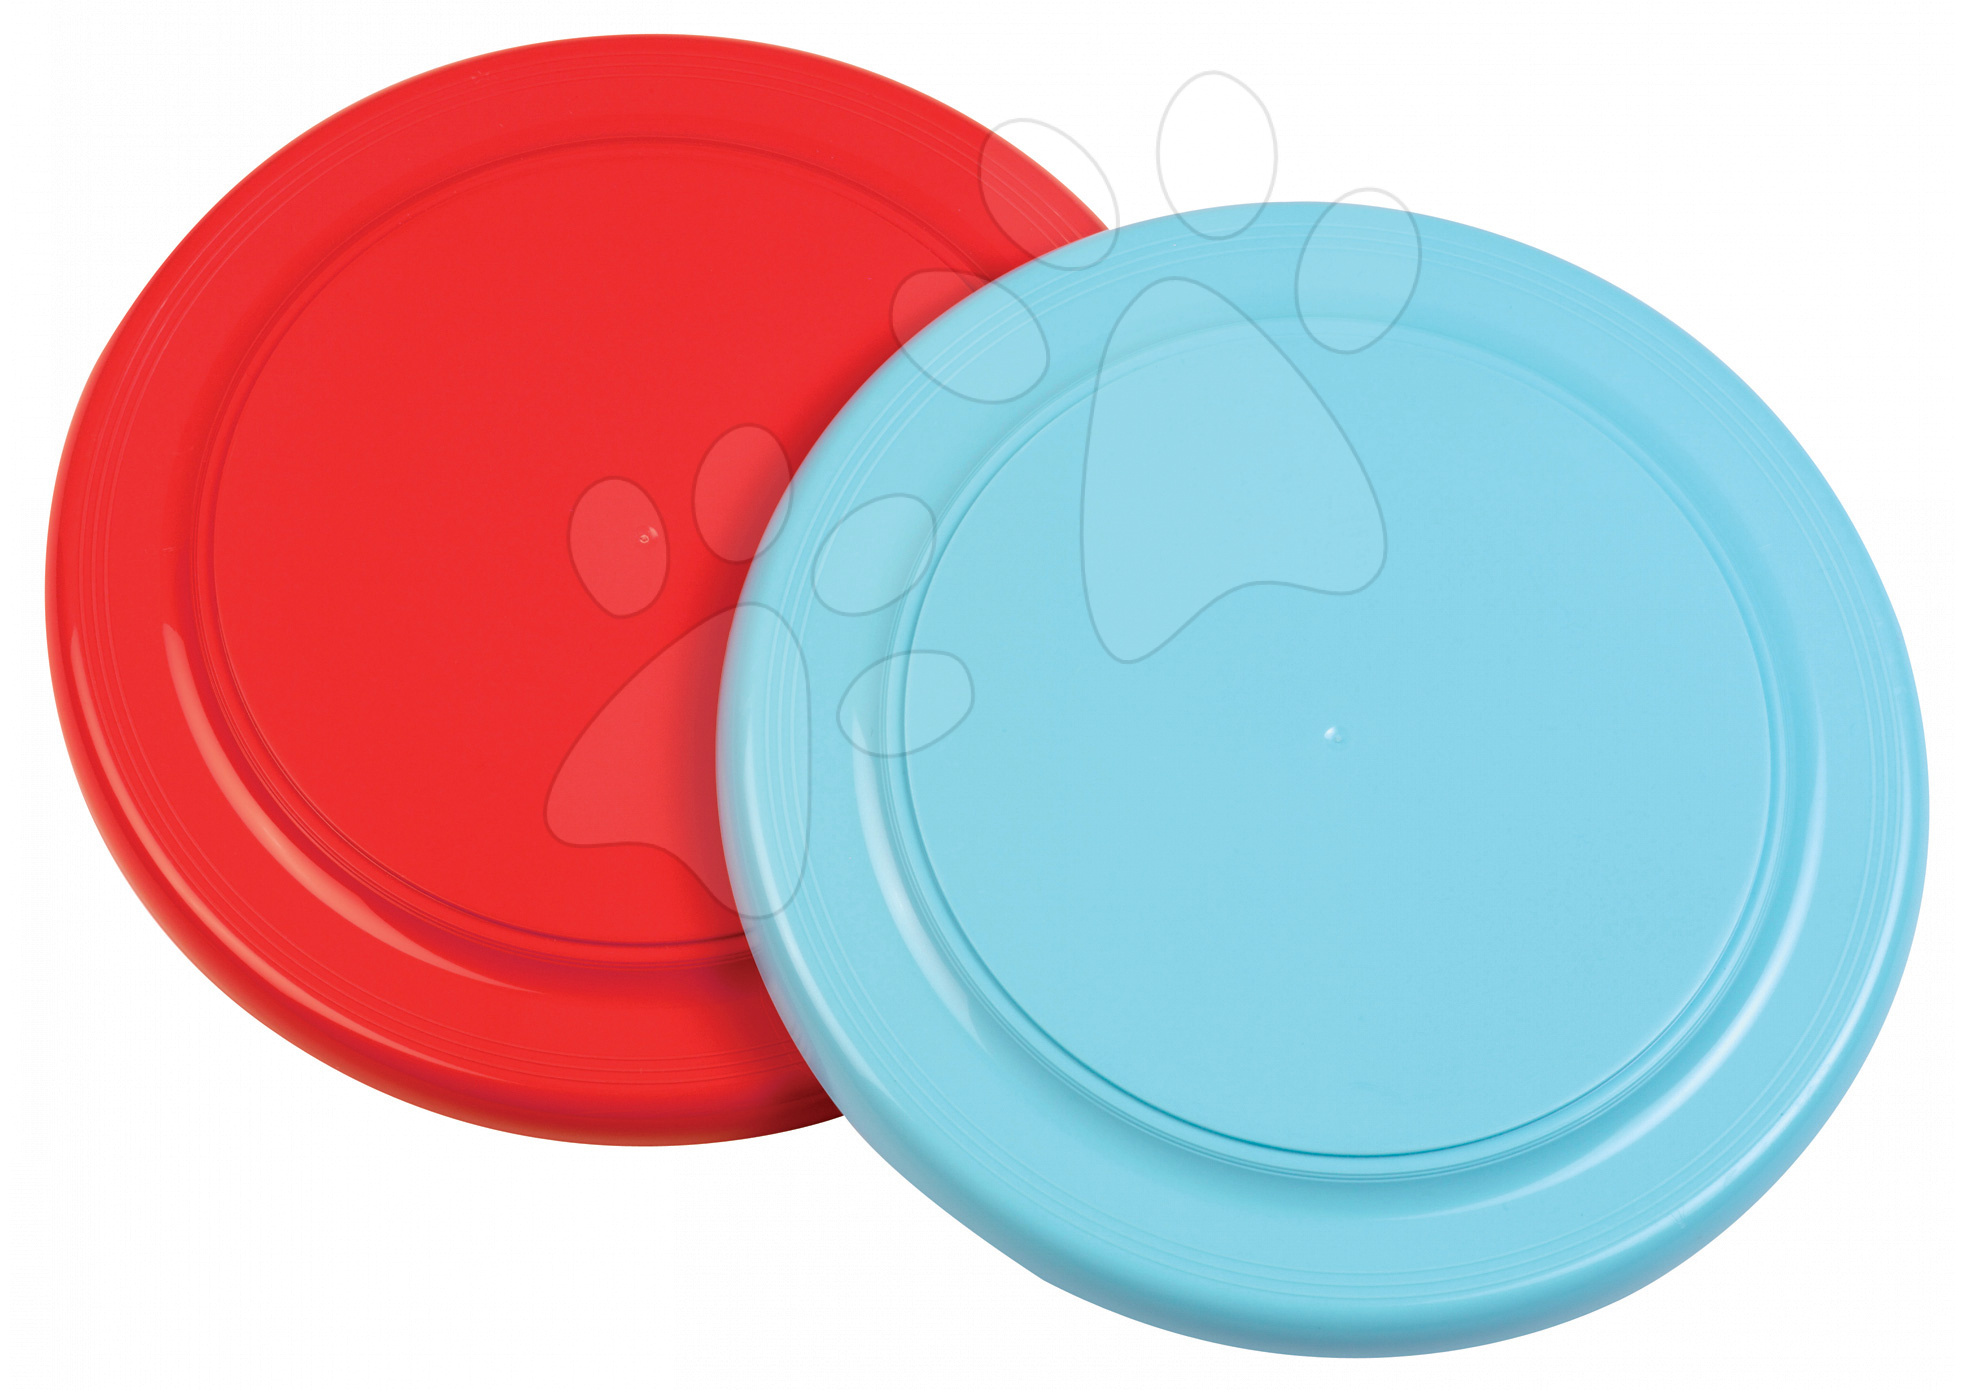 Lietajúce taniere - Lietajúci tanier Écoiffier priemer 22,5 cm bledomodrý/červený od 18 mes